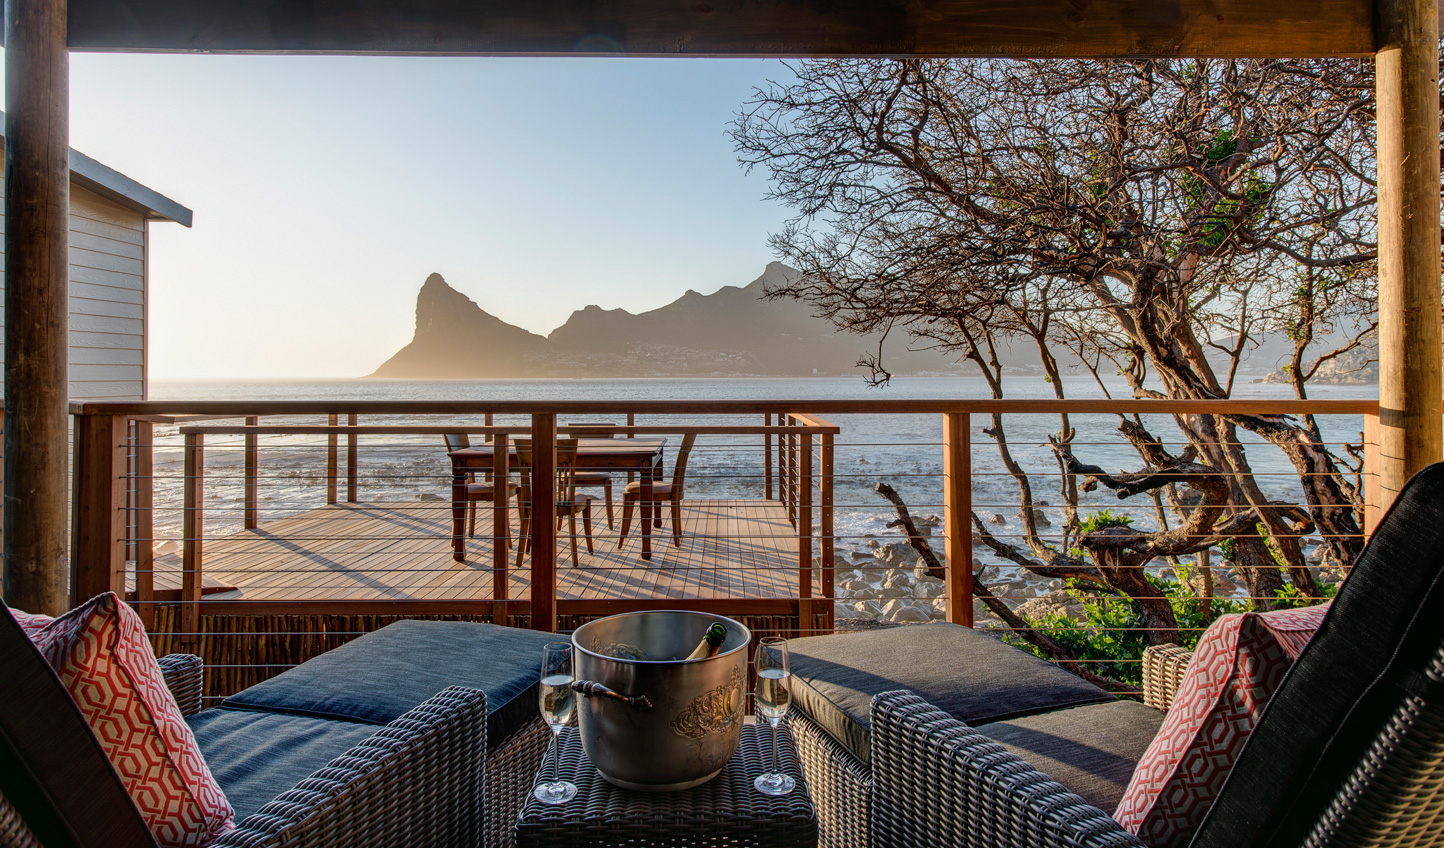 Soak in the views from Tintswalo Atlantic